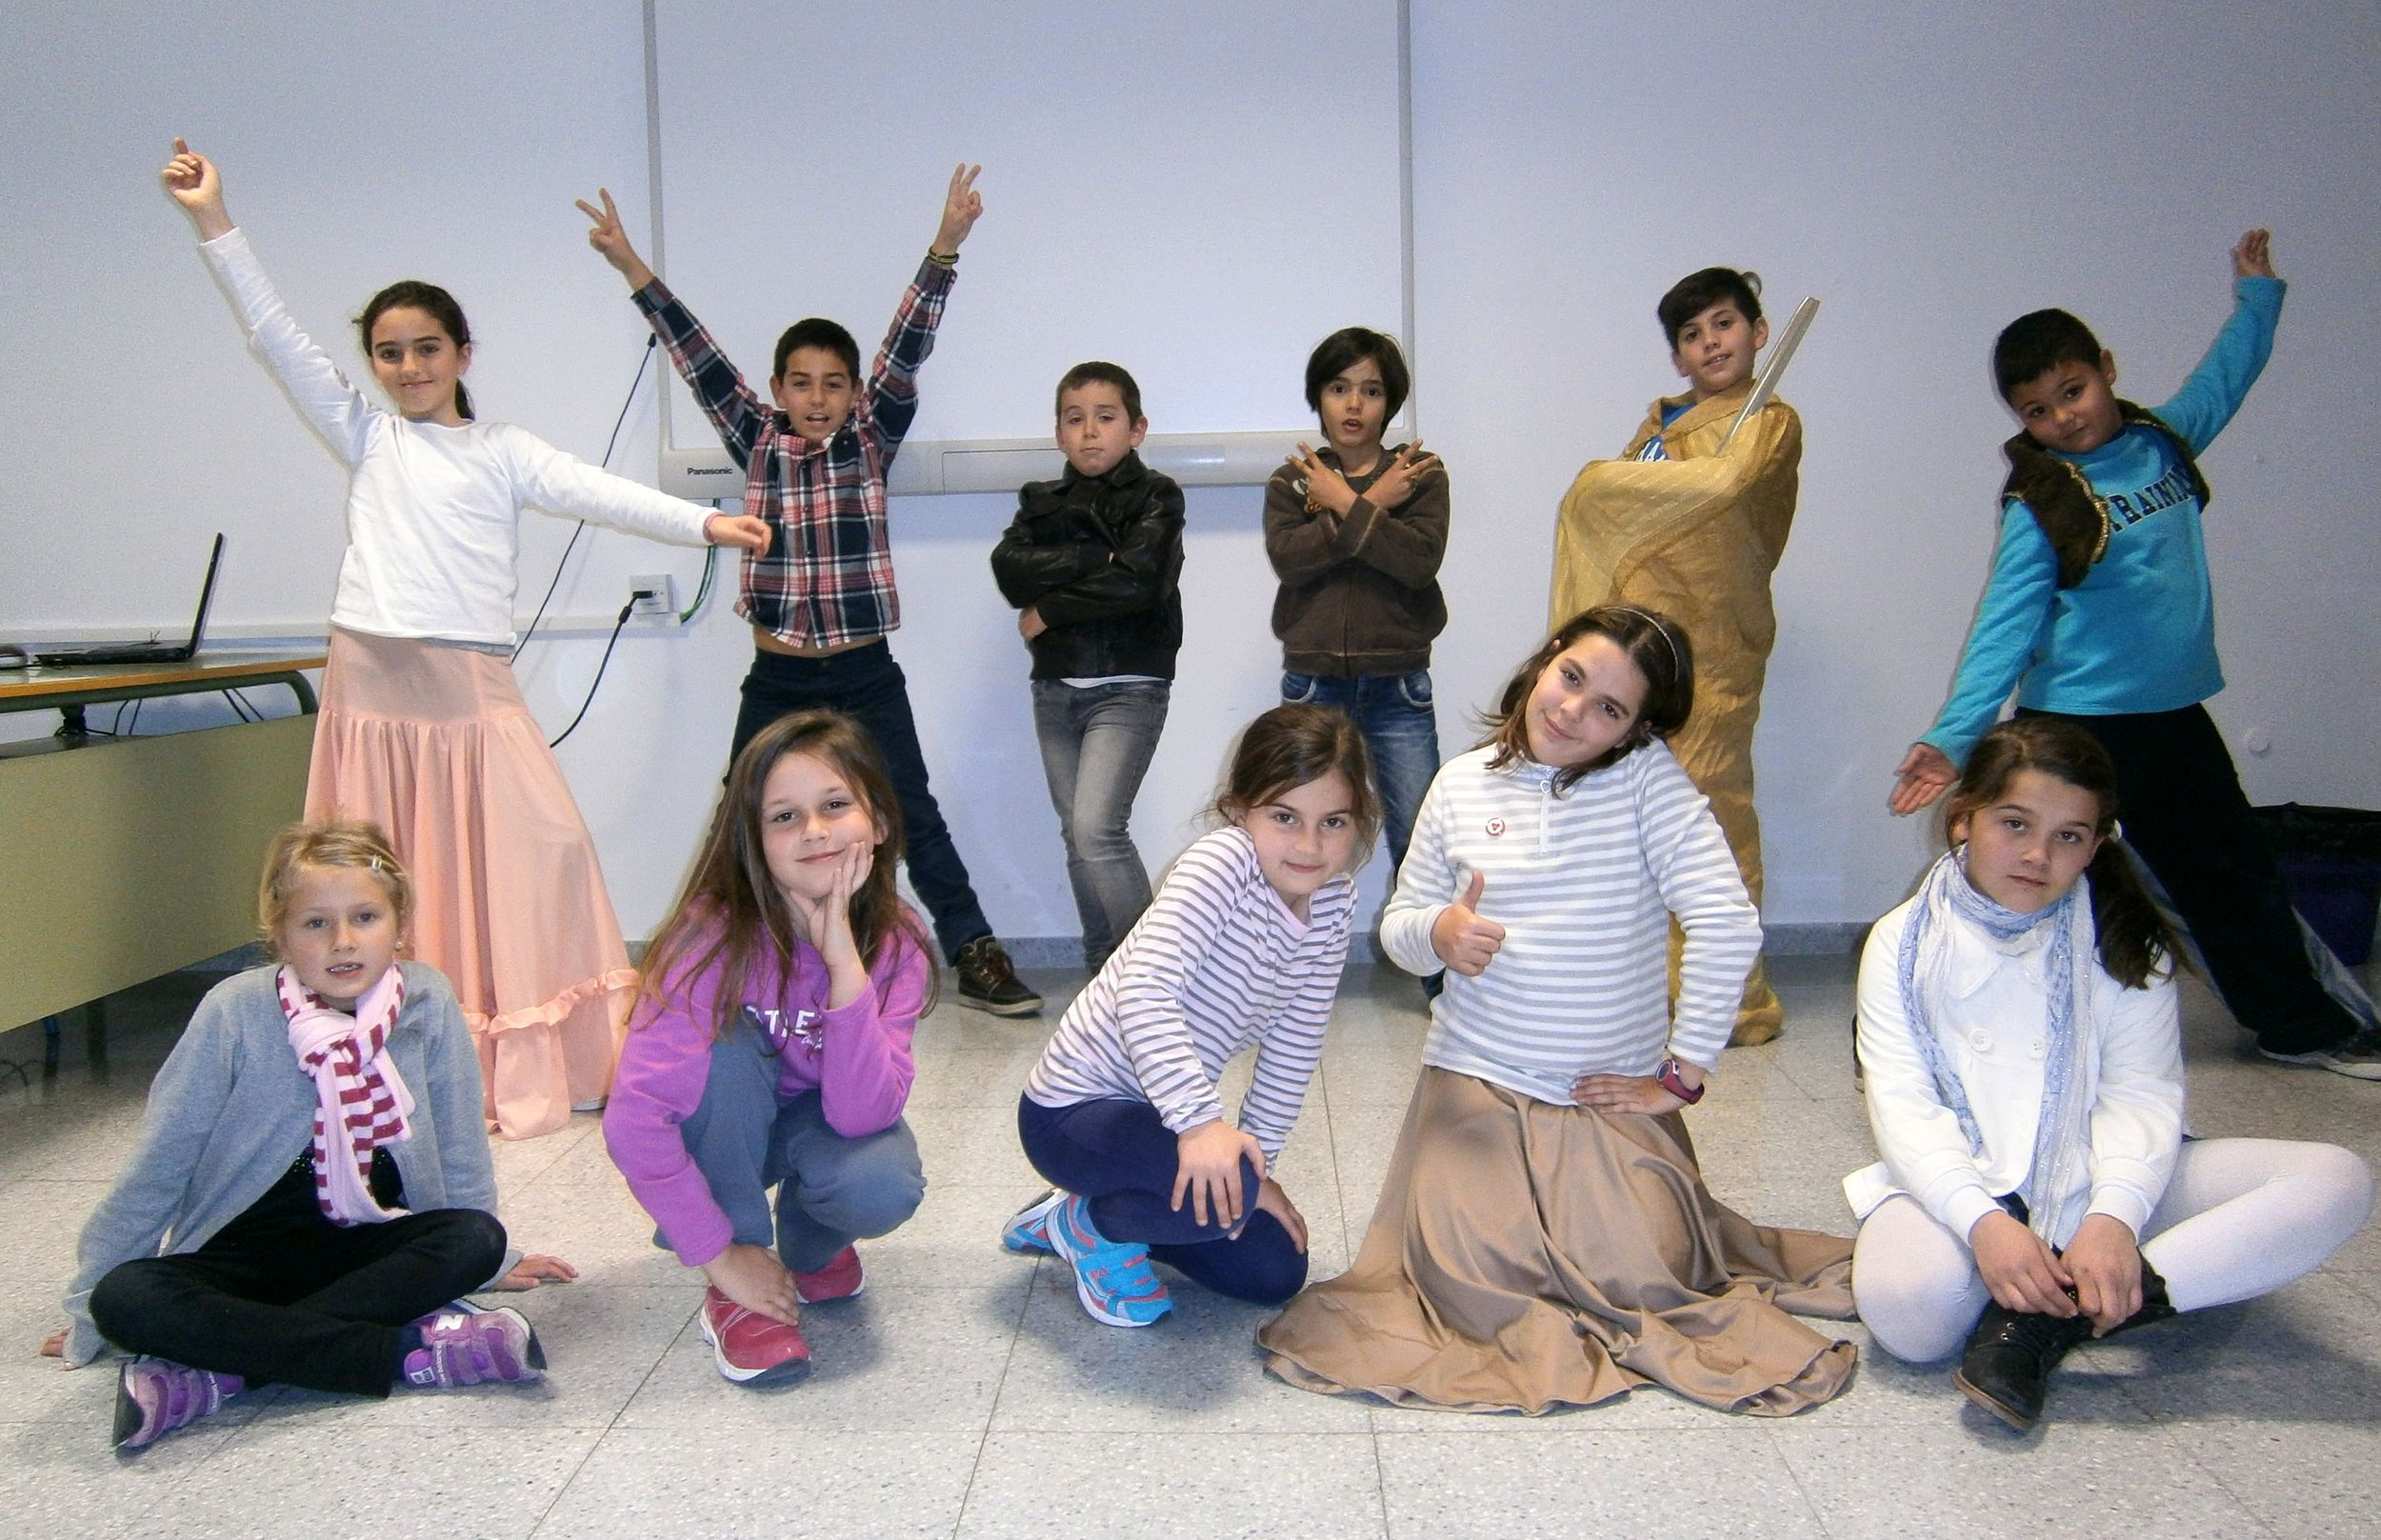 XXII Muestra de Teatro de Centros Docentes: CEIP La Leala 'Un pequeño mundo musical'